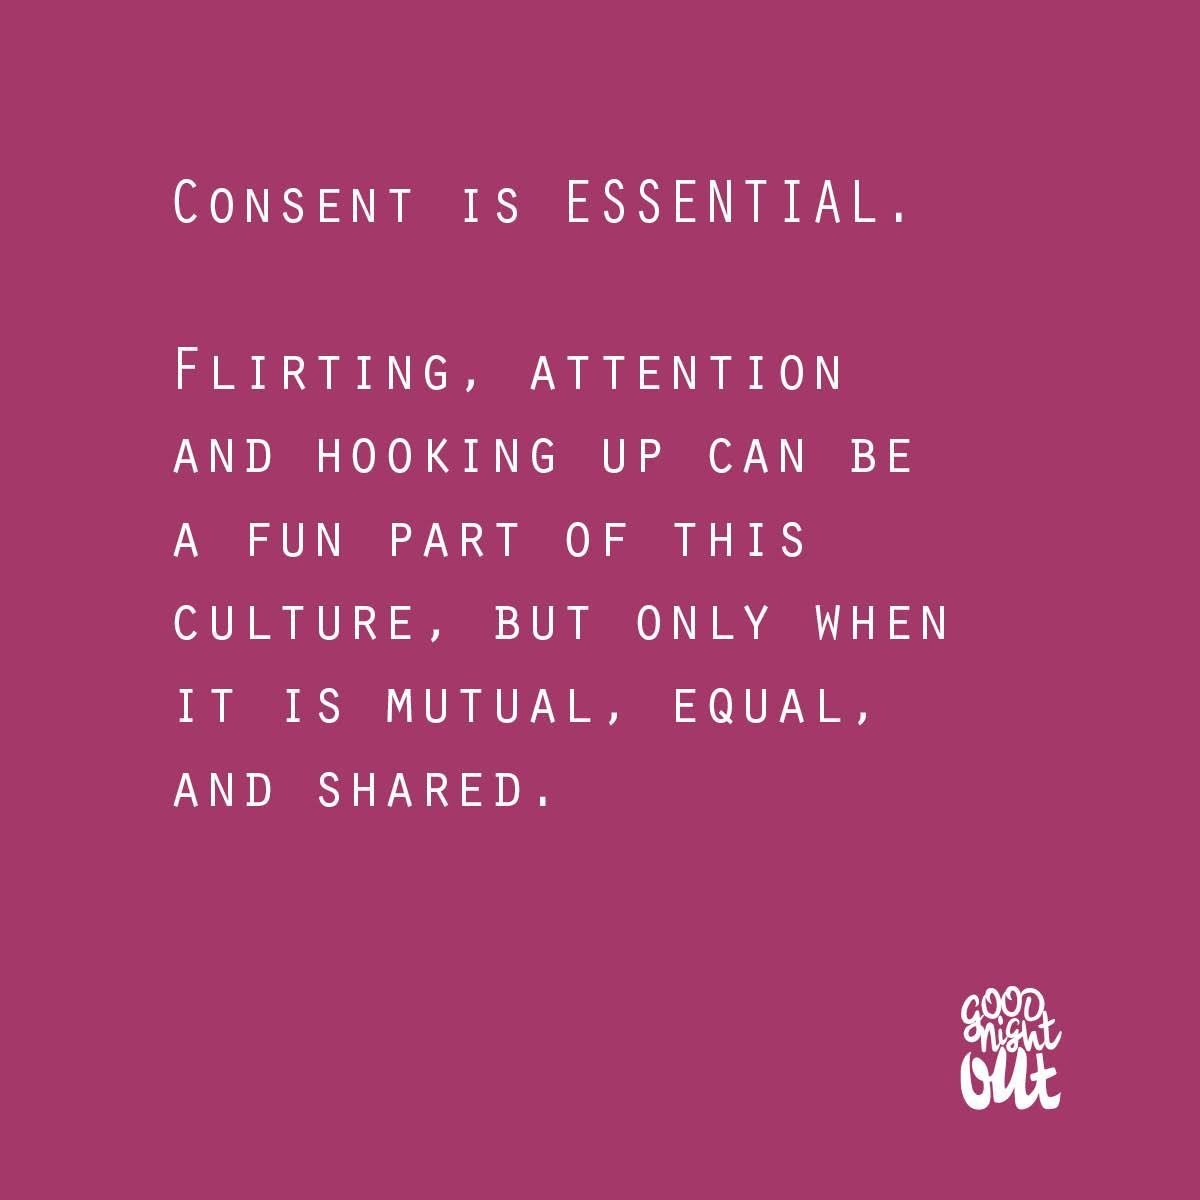 consent cards 15.jpg